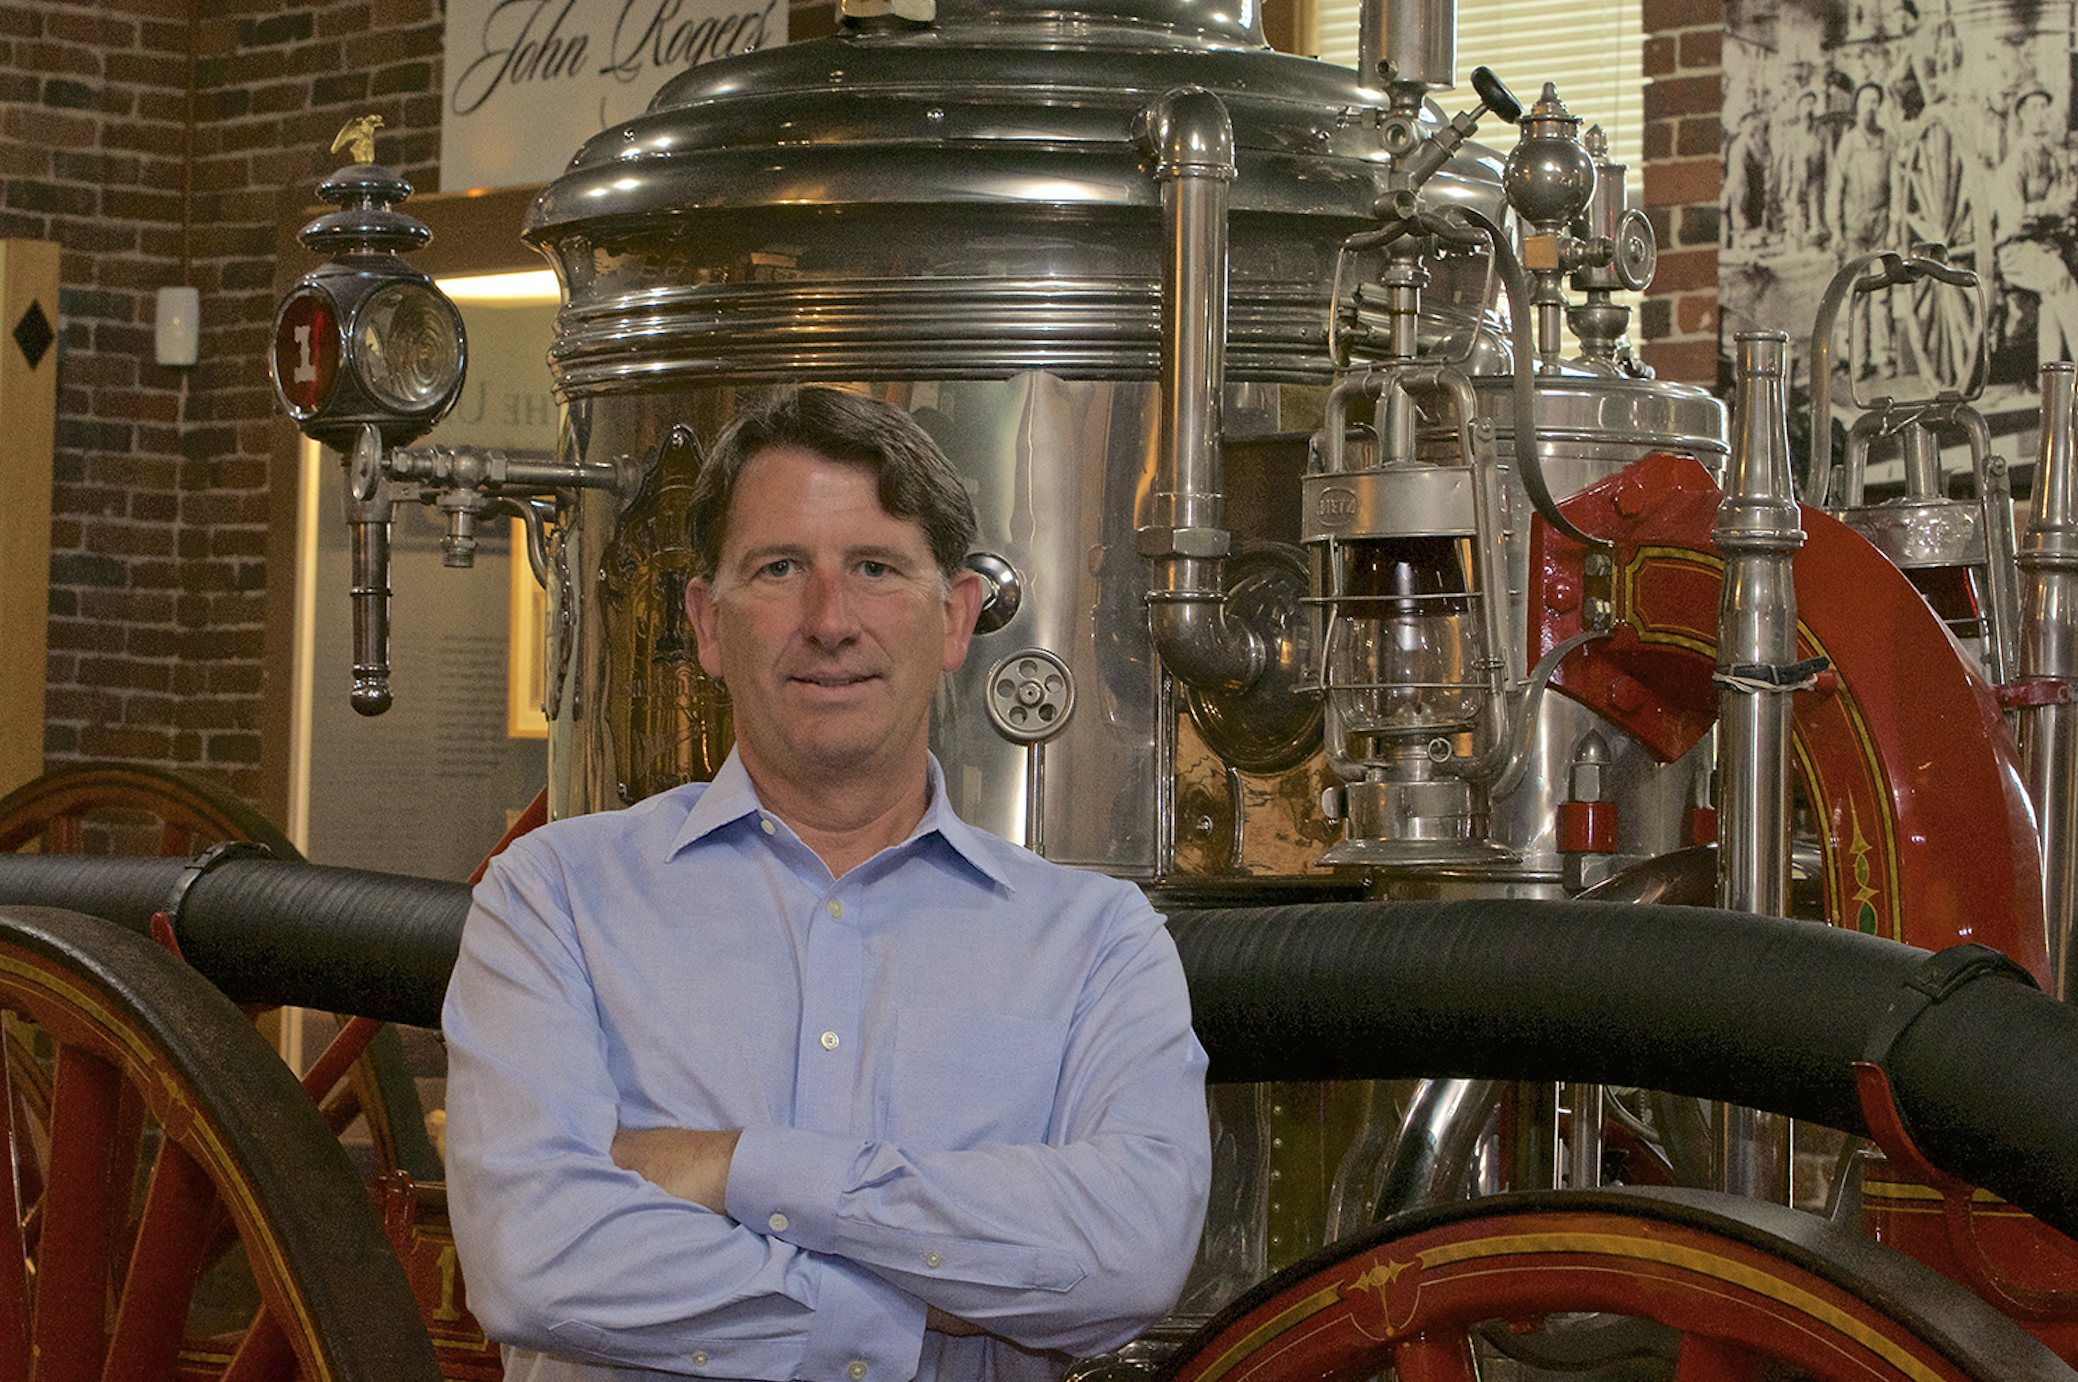 Matt Cookson, Executive Director of the New Hampshire High Tech Council (NHHTC)